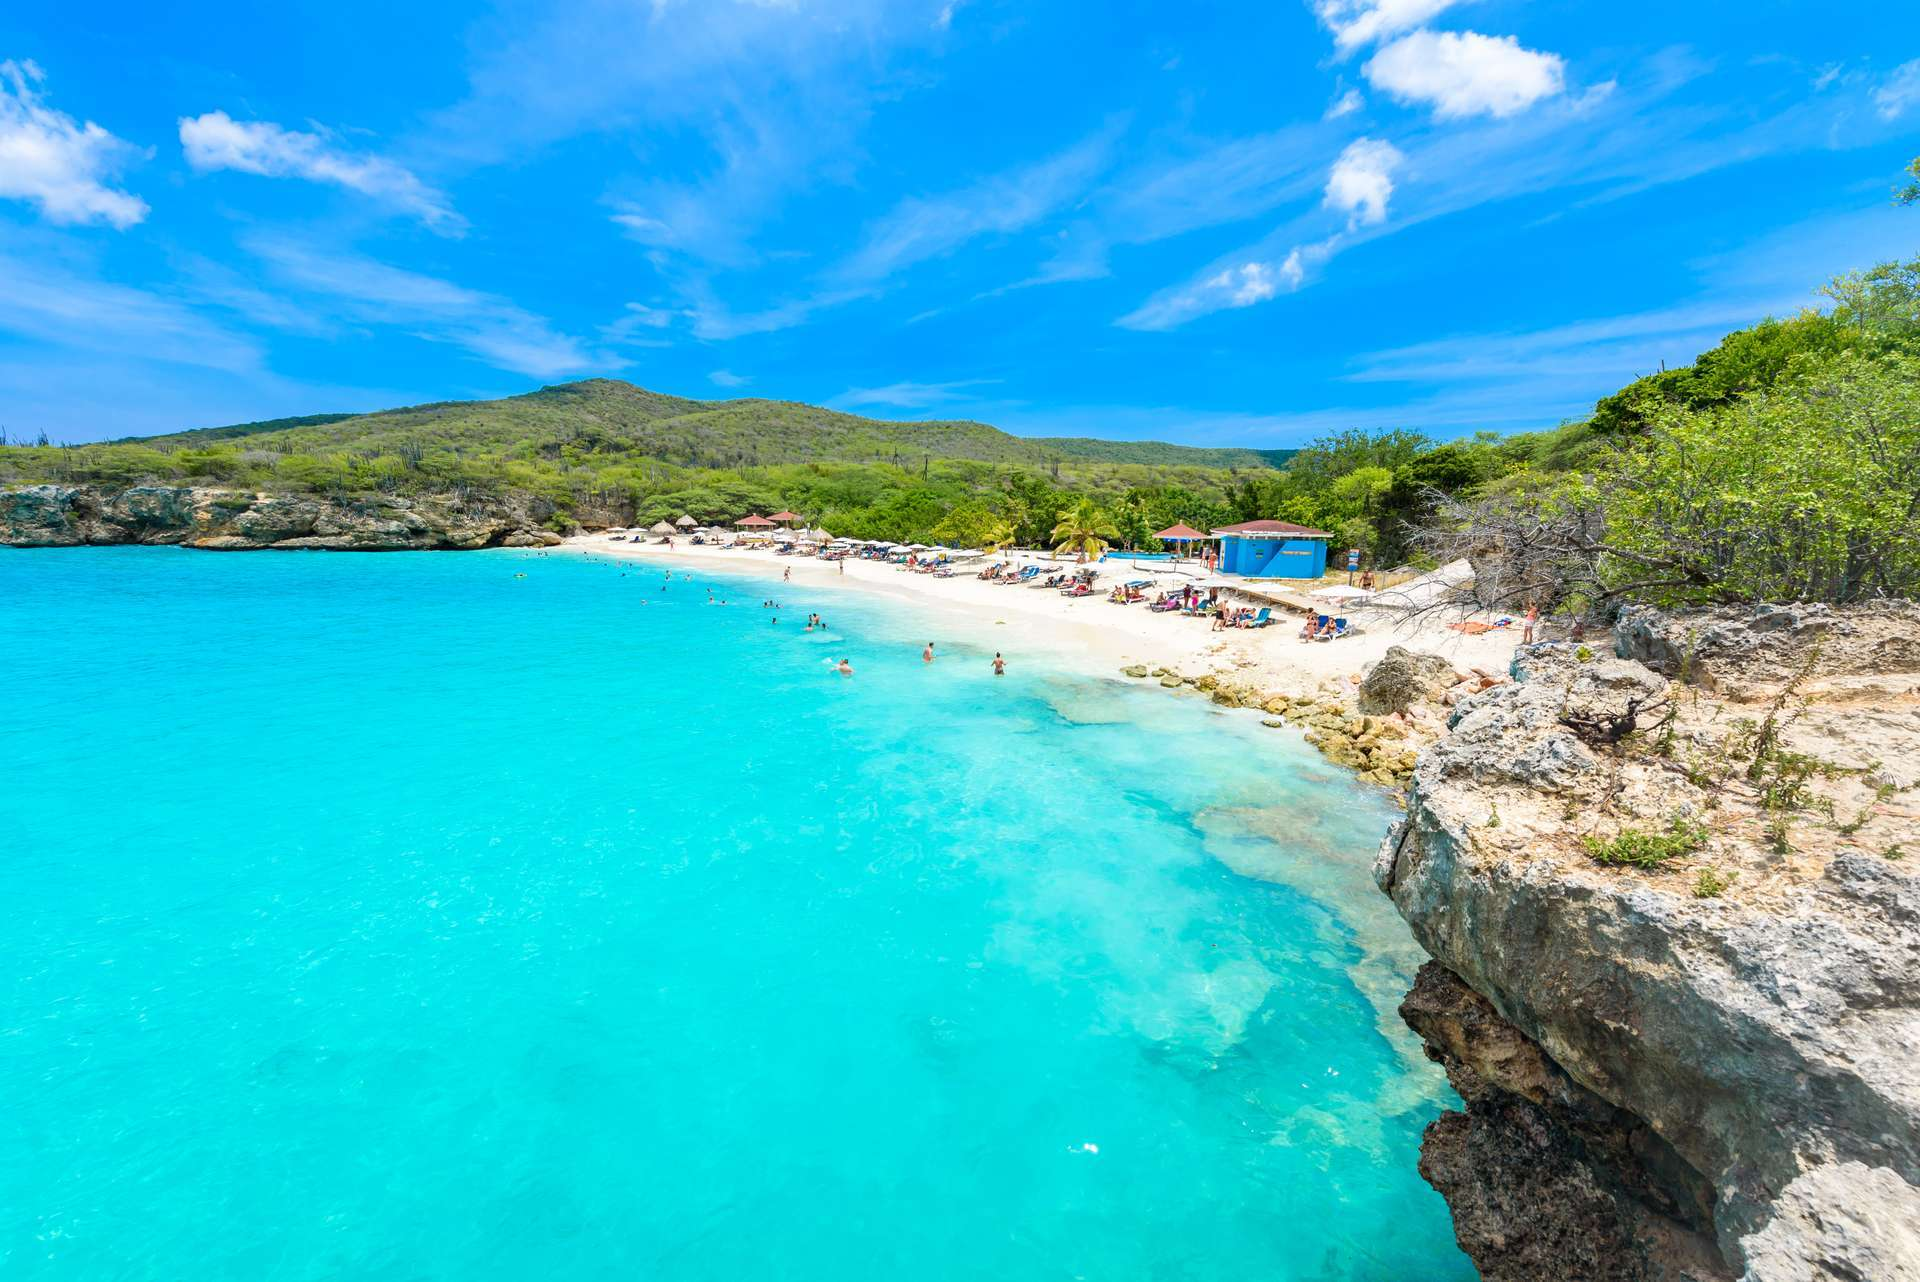 Vakantie Curaçao Grote Knip